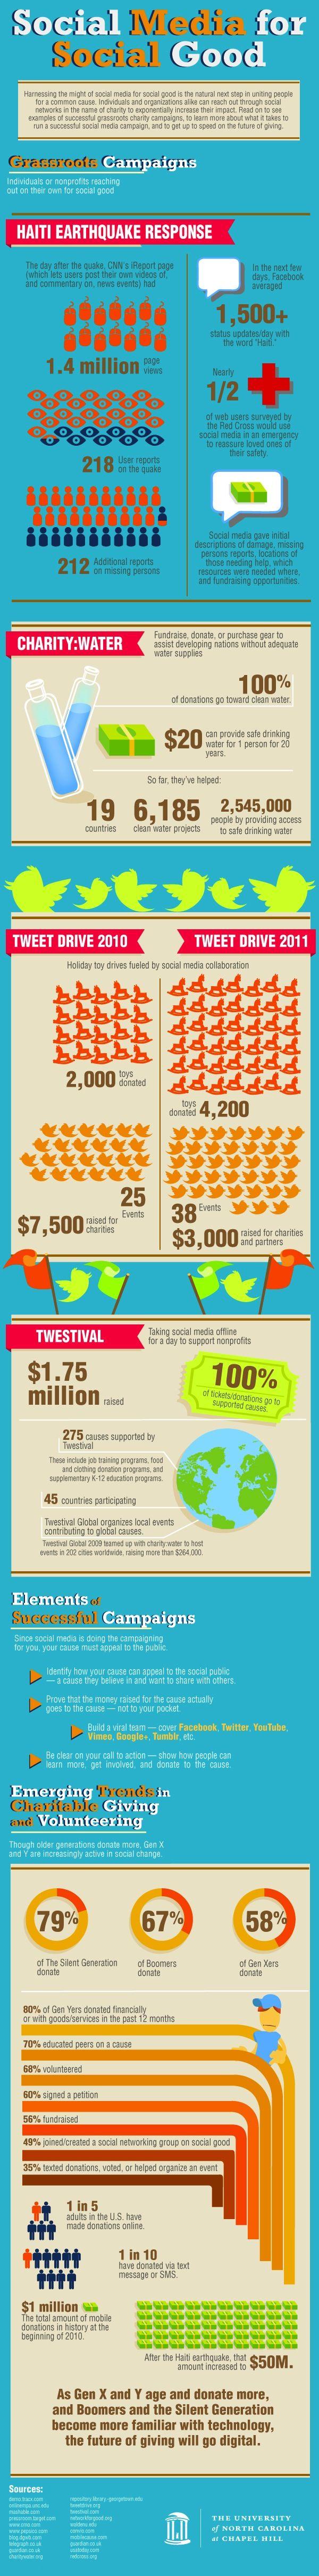 Social Media's Impact on Real